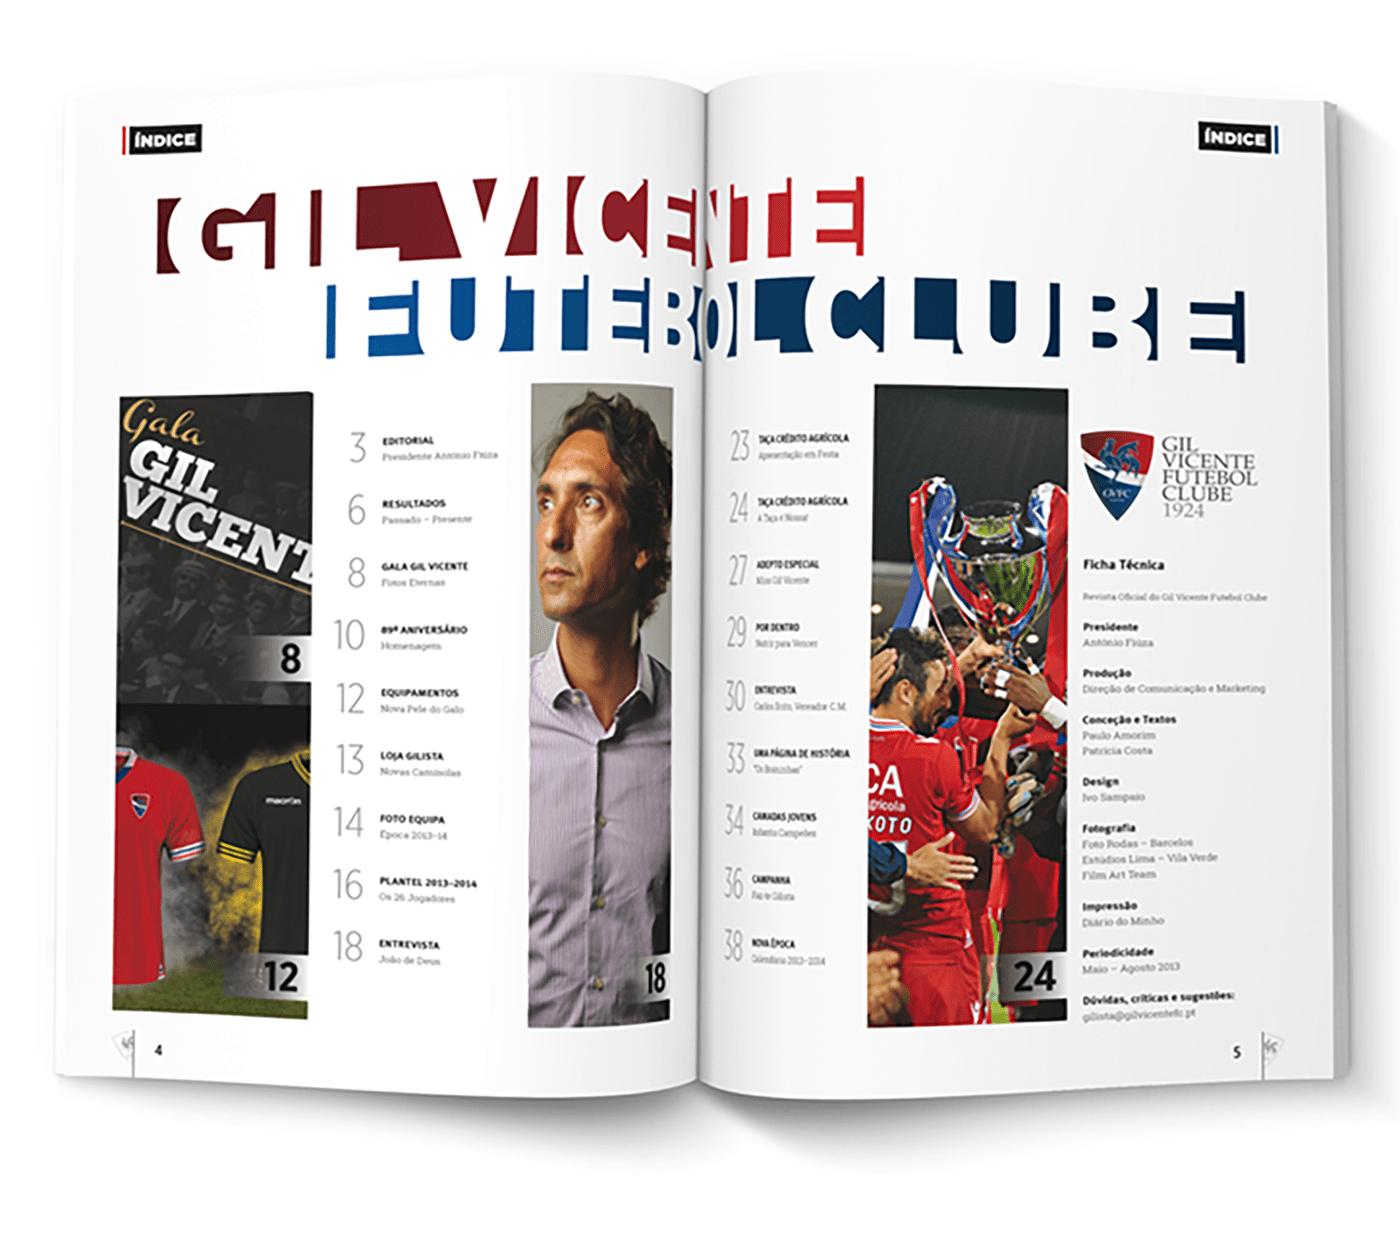 gvfc gilista N4 gil gil vicente FC sport football futebol soccer magazine clube Barcelos revista